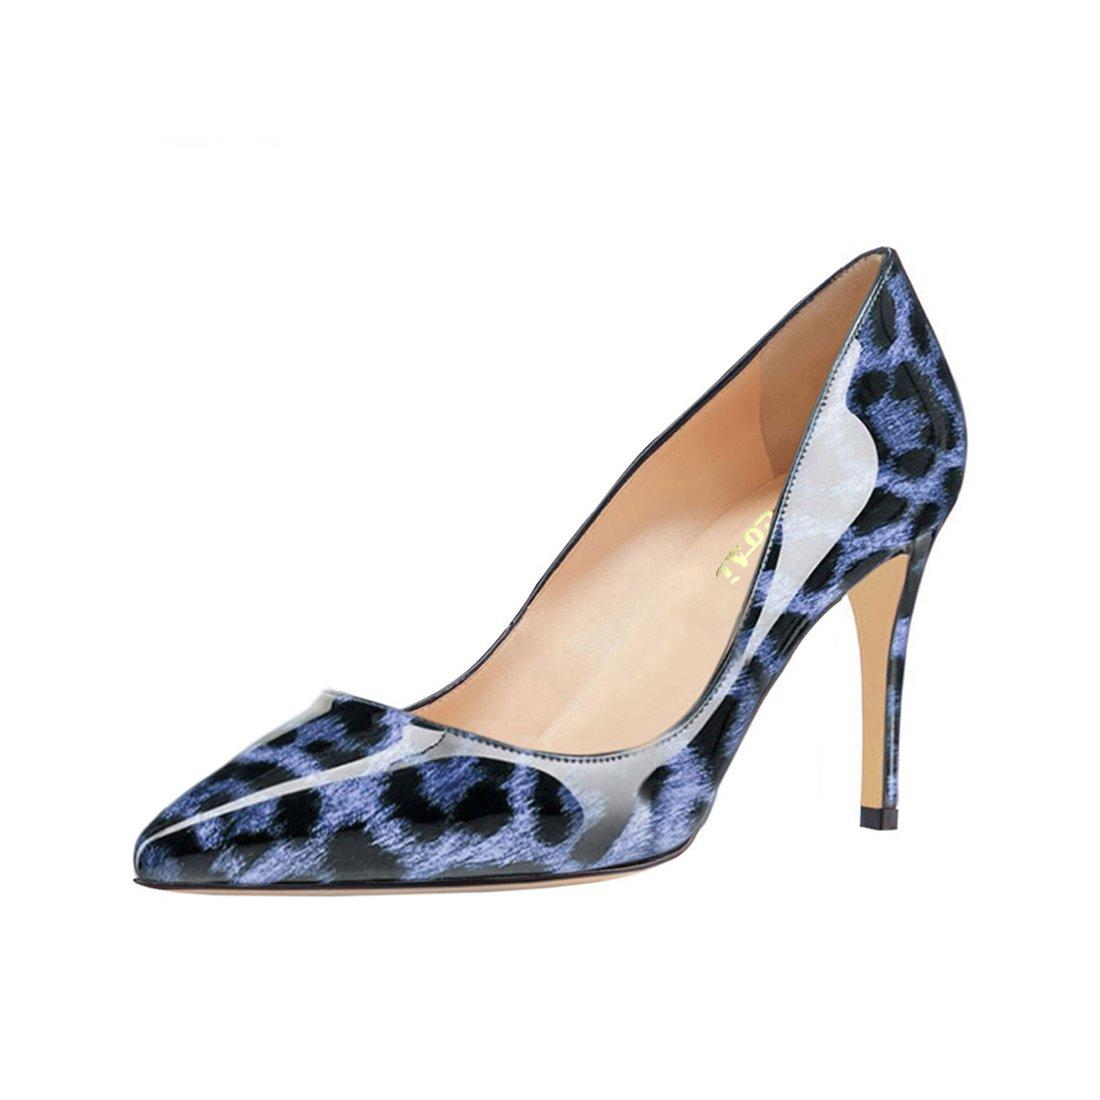 VOCOSI Women's Basic Simple High Heels Slip On Closed Pointed Toe Ladies Dress Pumps B073JFSFNS 7.5 B(M) US|Blue Leopard-patent